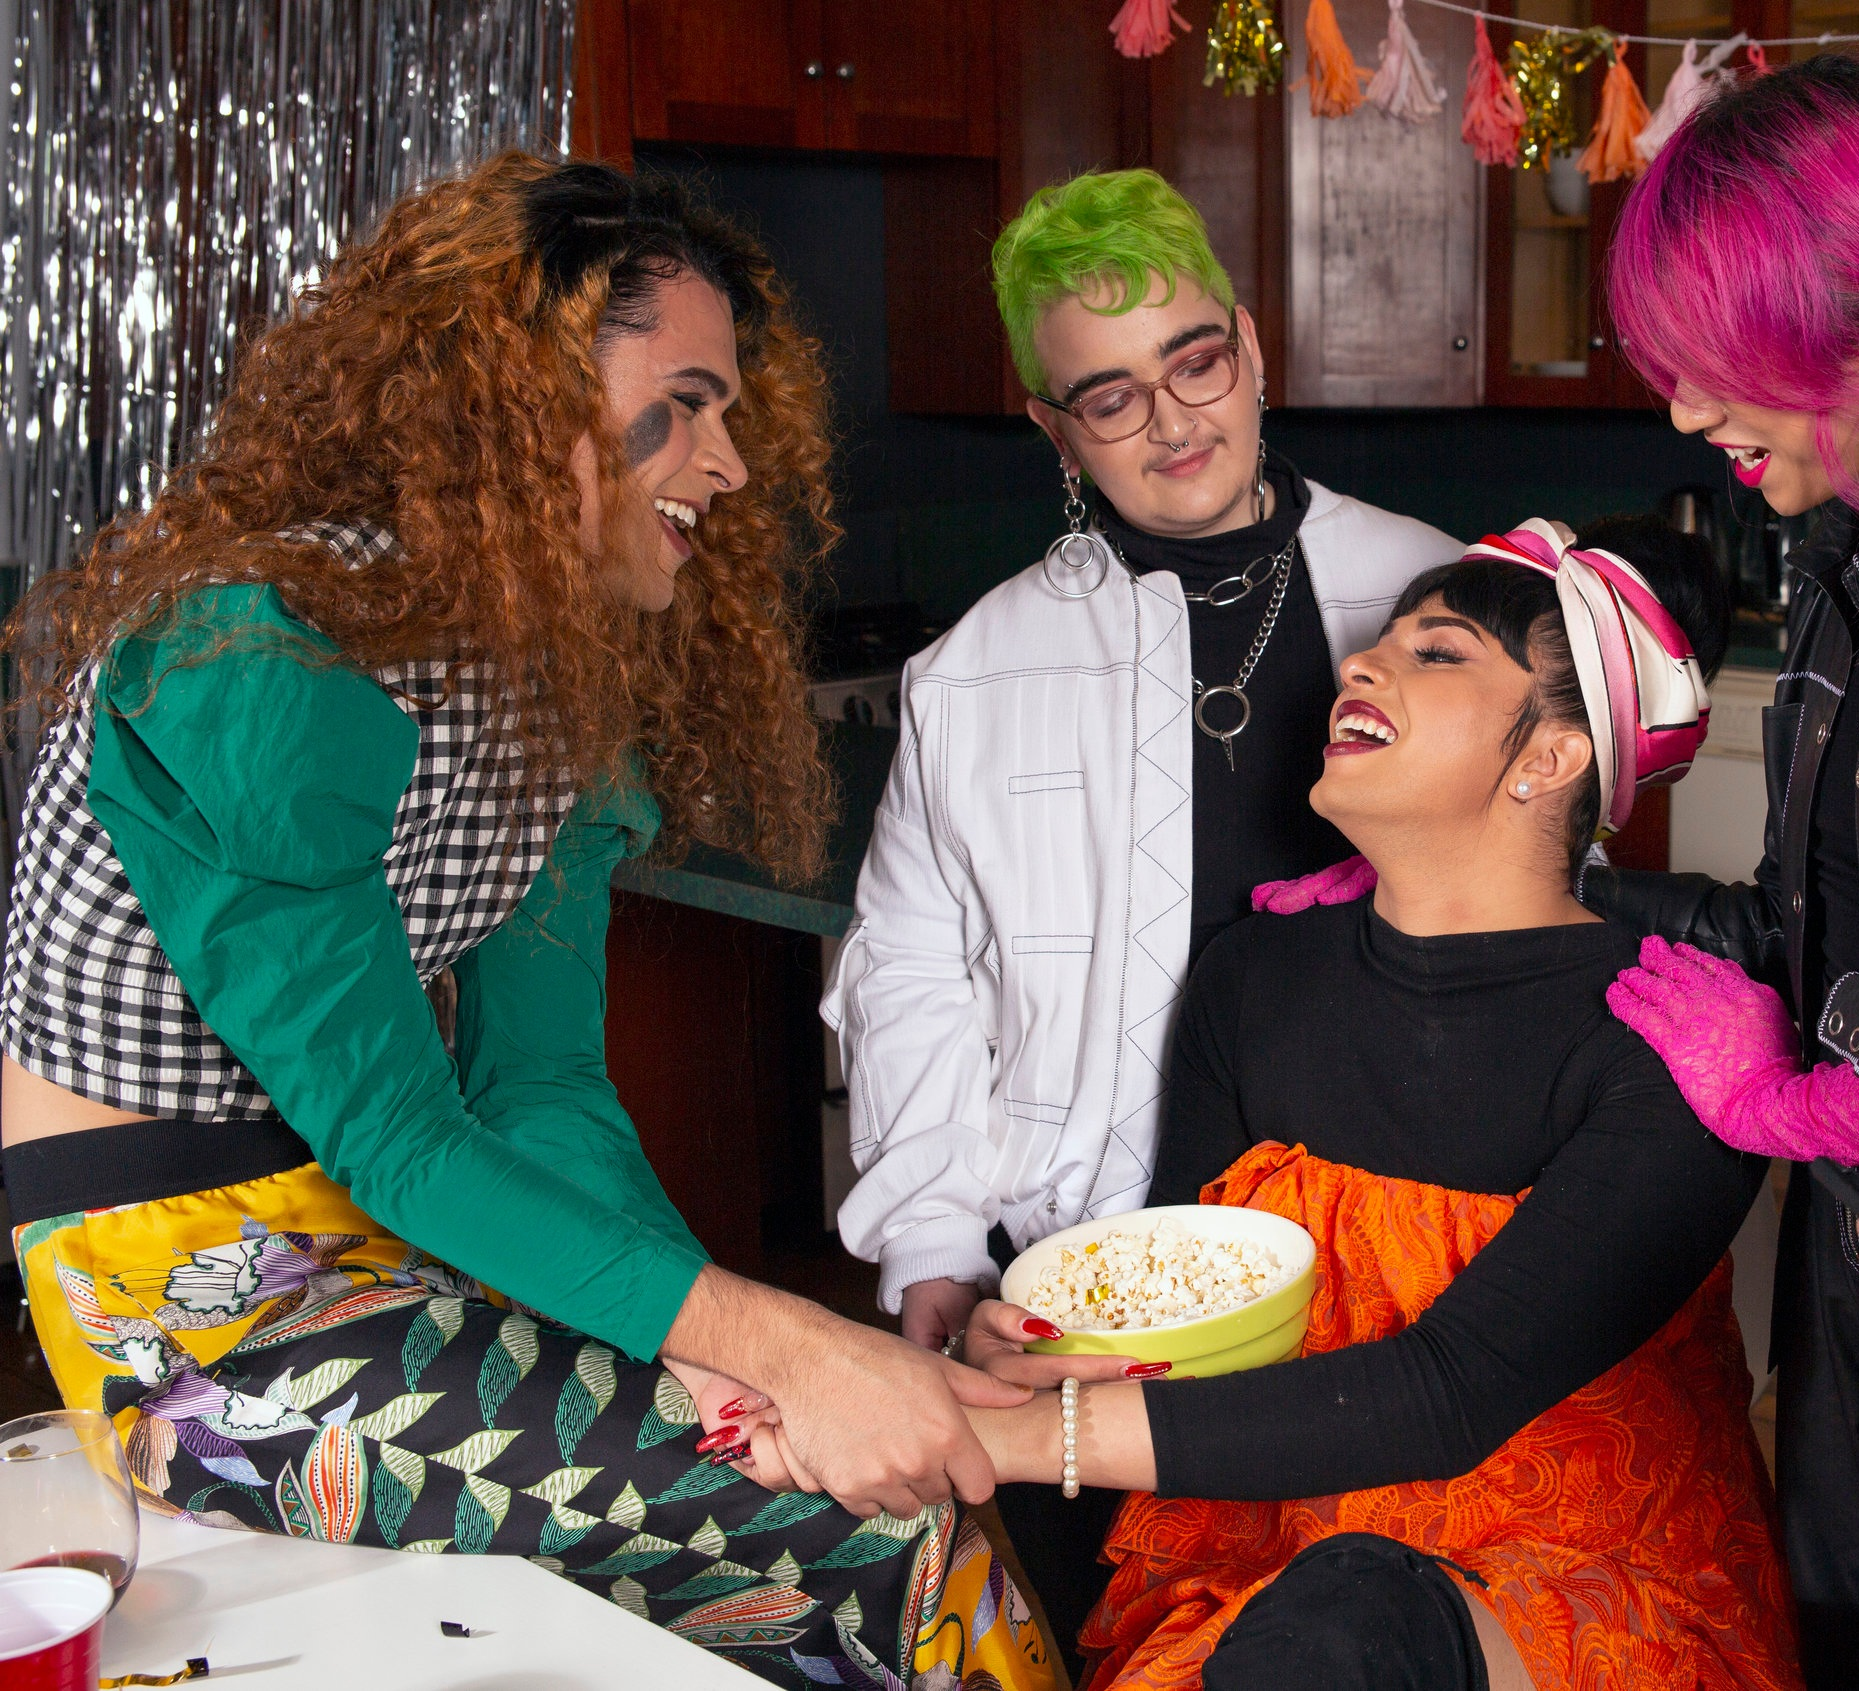 A group of friends of varying genders celebrating.jpg